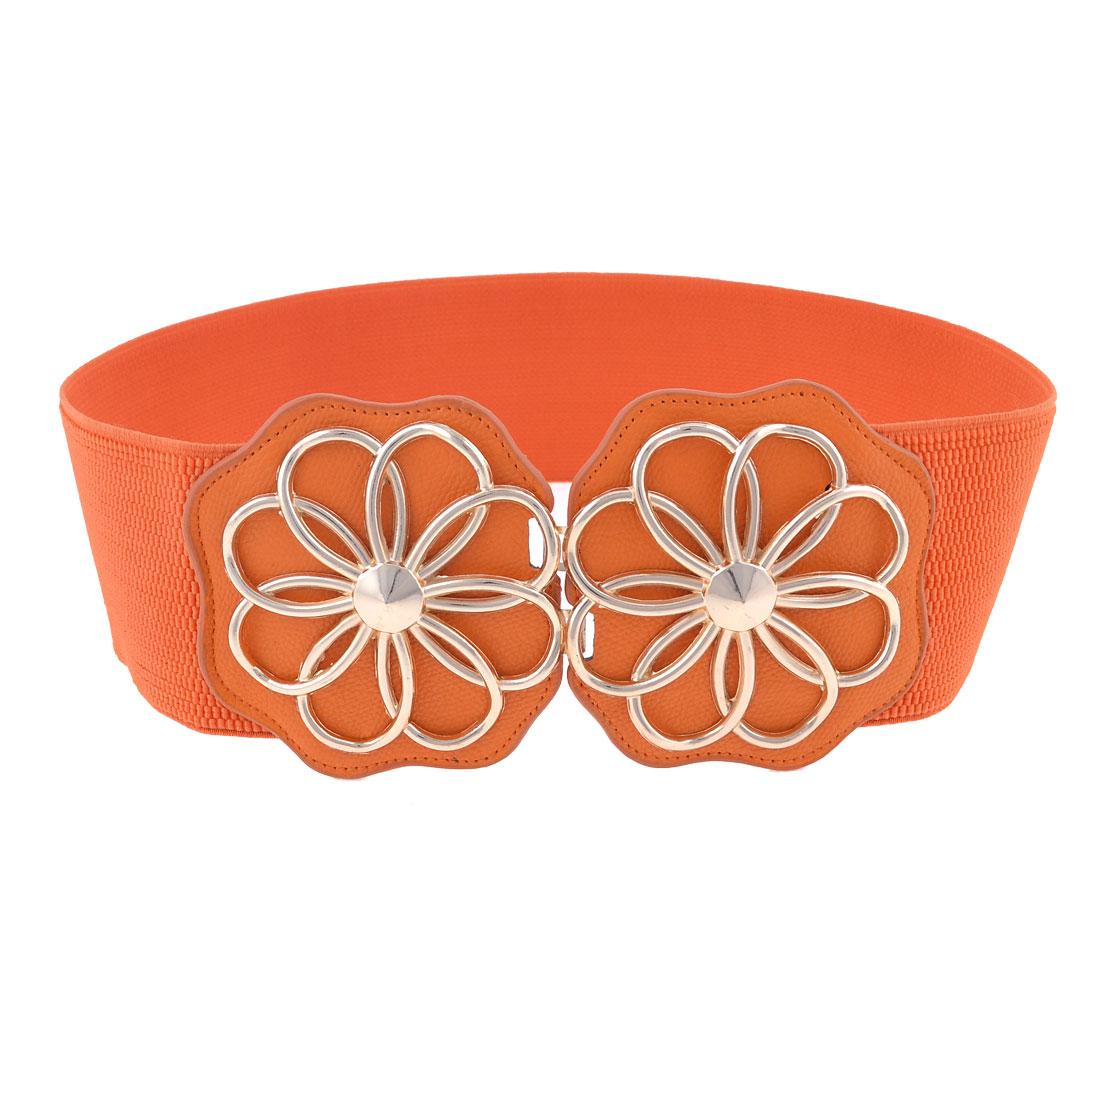 Women Double Flowers Interlocking Buckle Stretch Waistband Cinch Belt Orange